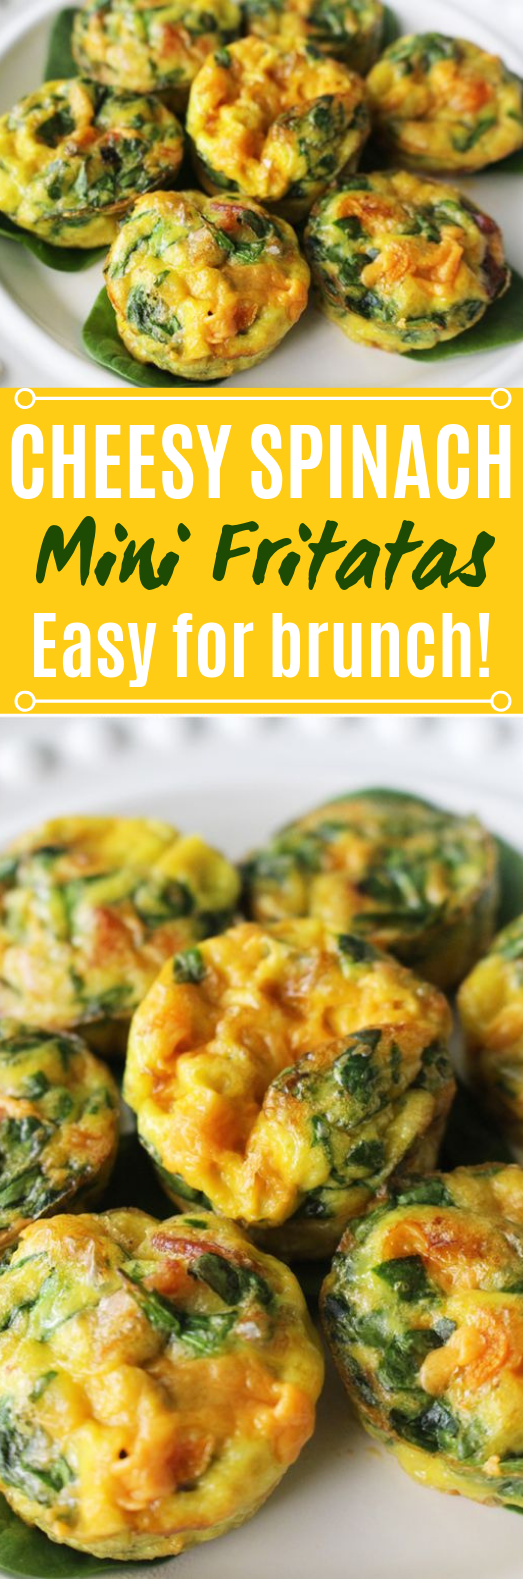 Cheesy Spinach Mini Frittatas #healthy #breakfast